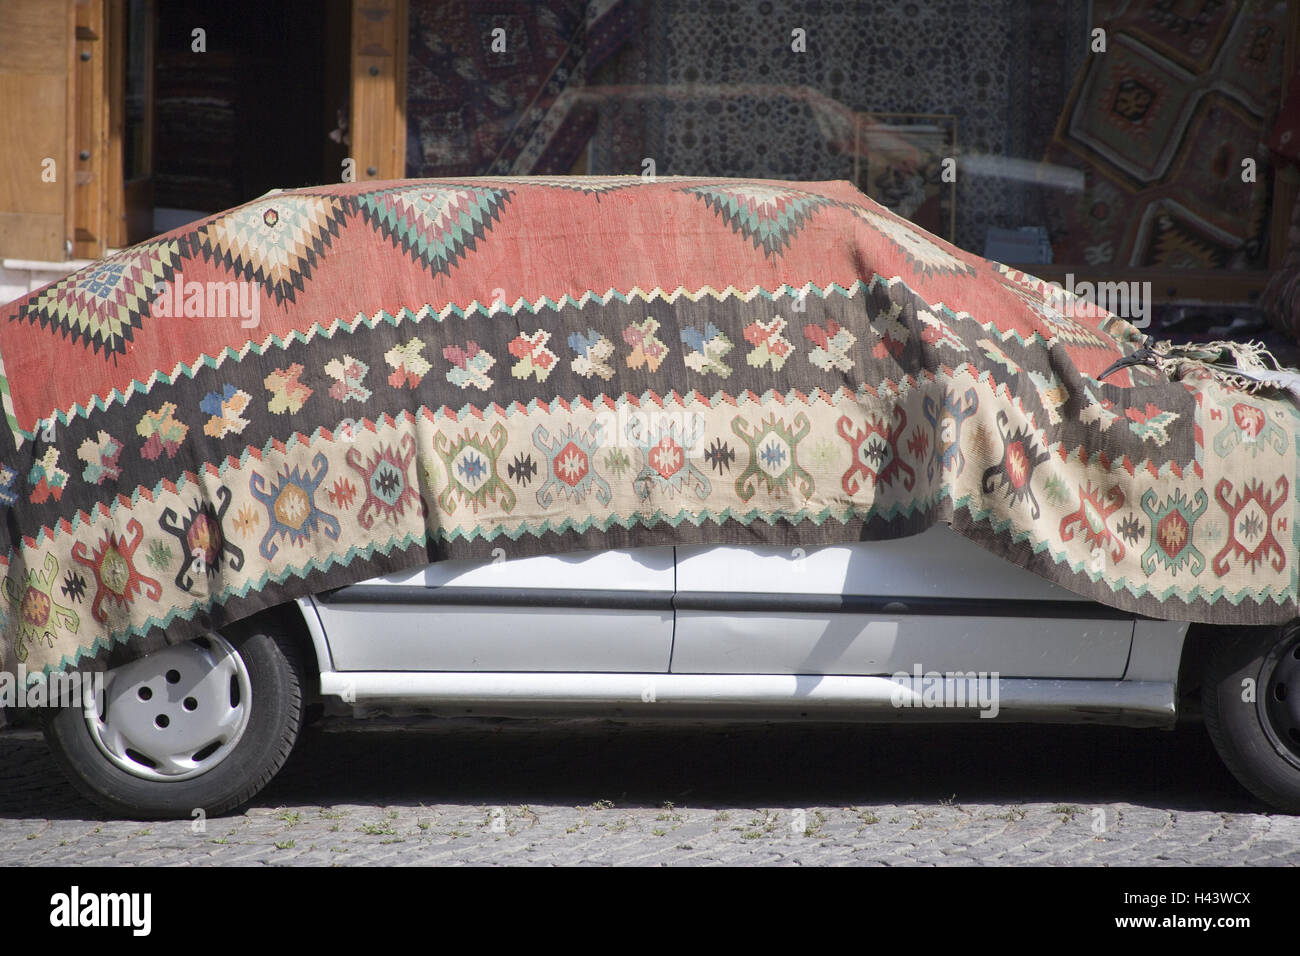 Turkey, Istanbul, part town Sultanahmet, car, carpet, town, city, roadside, passenger car, vehicle, park, cover, cover, protection, protective cap, protect, ...